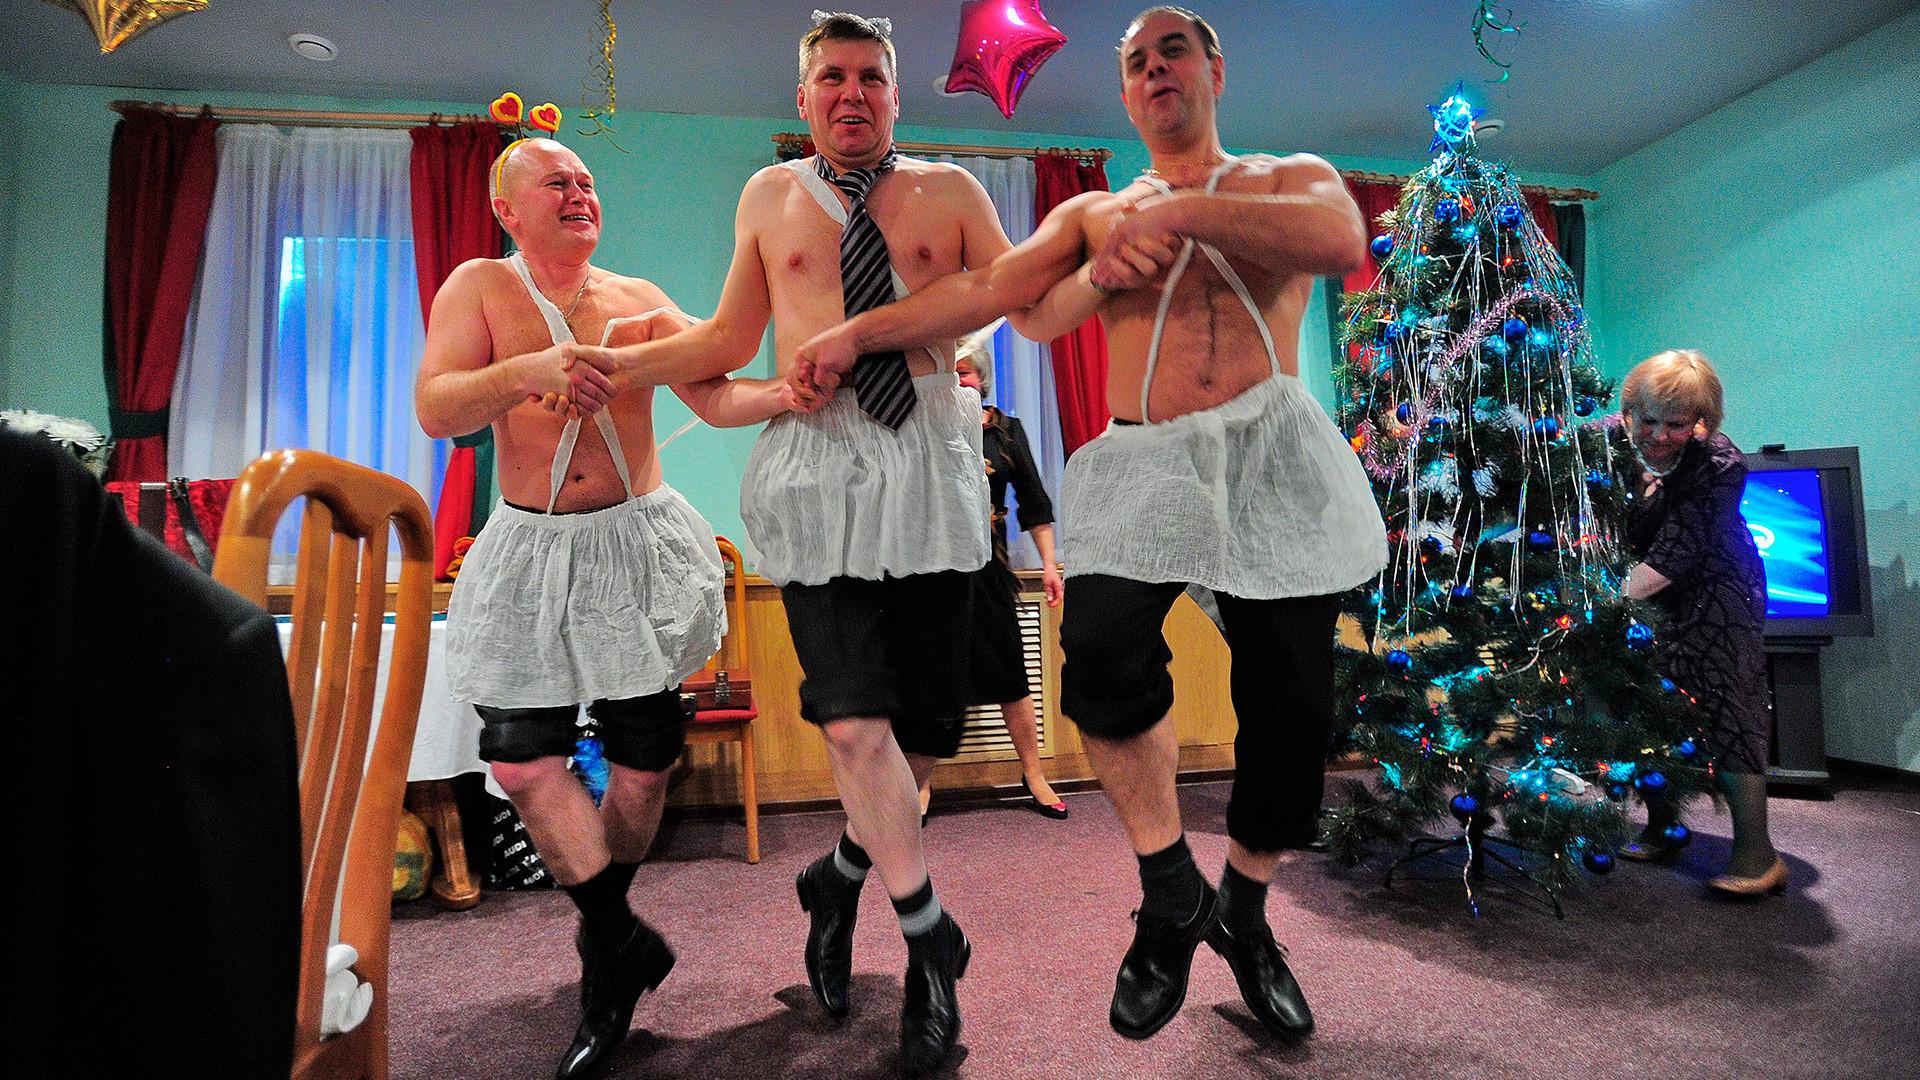 Festa de Ano Novo na Rússia